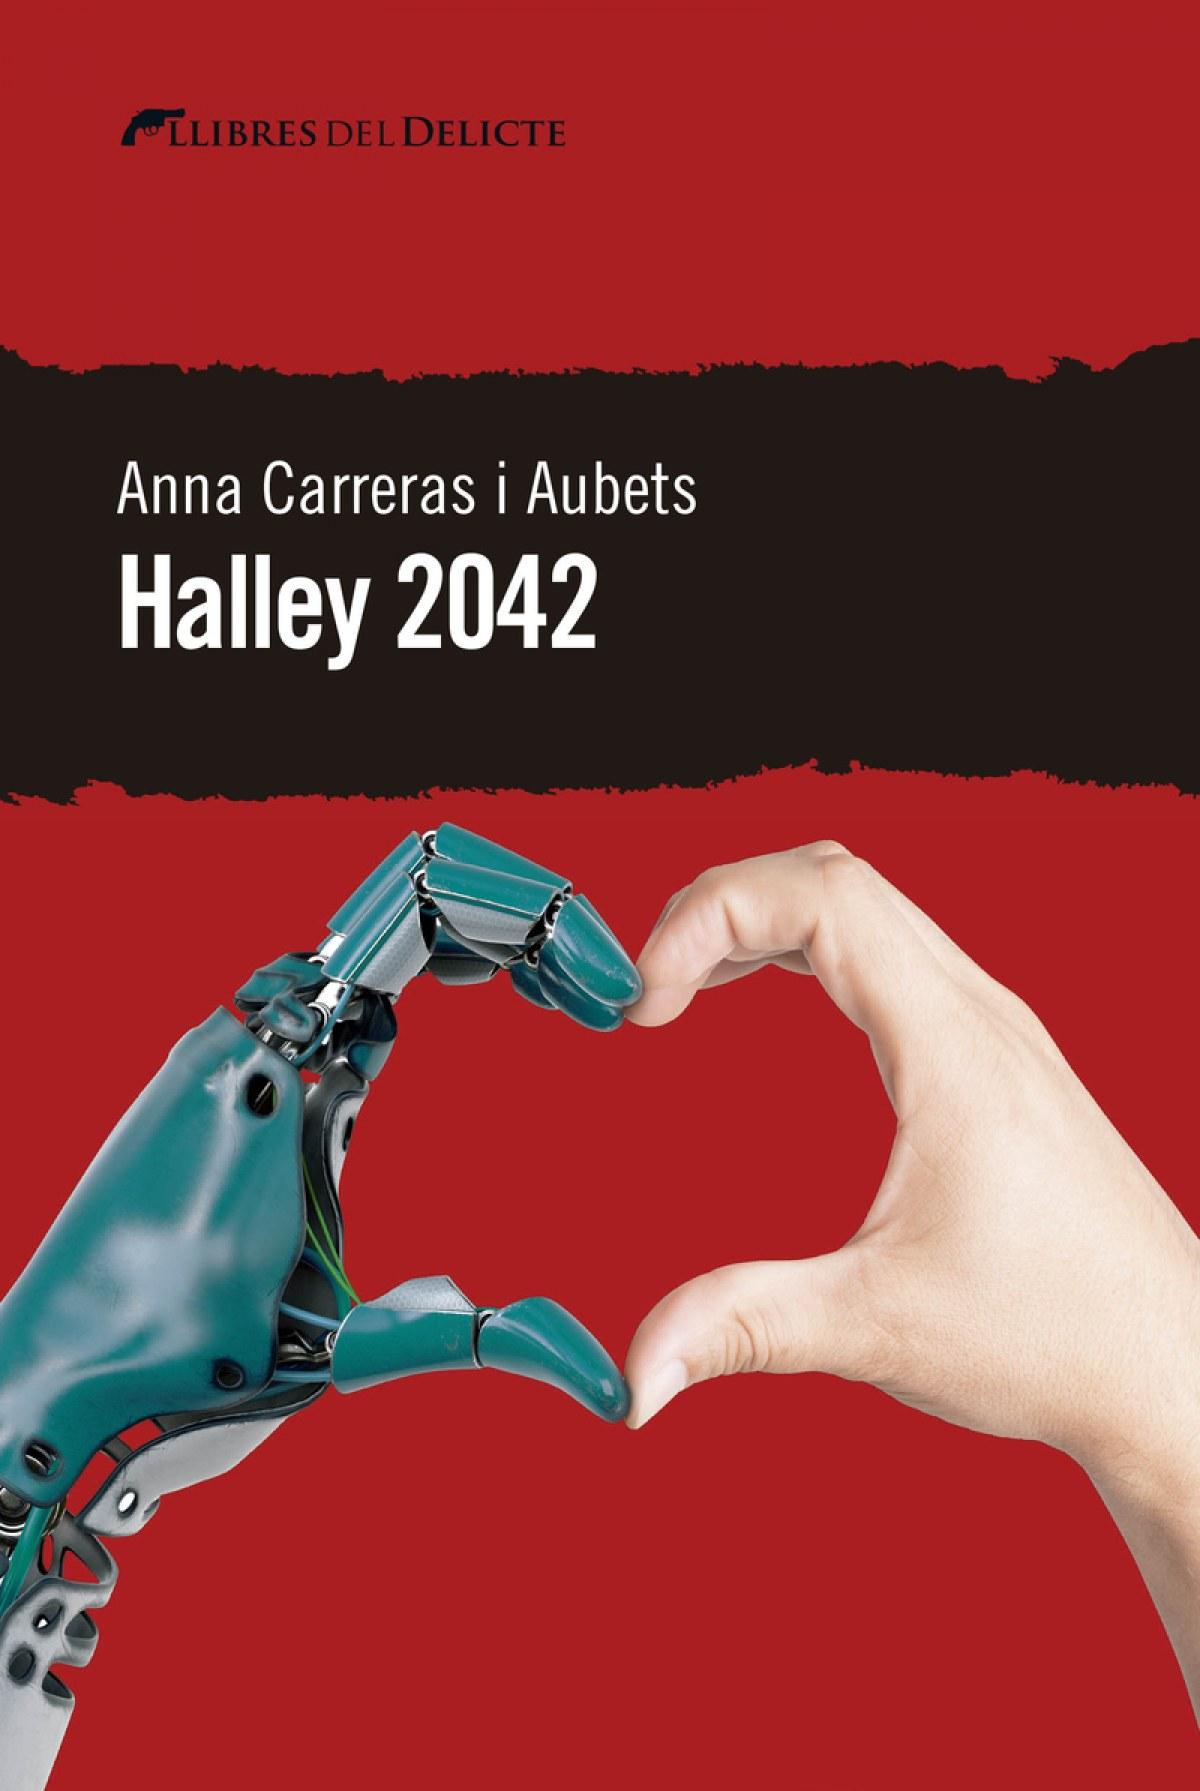 Halley 2042